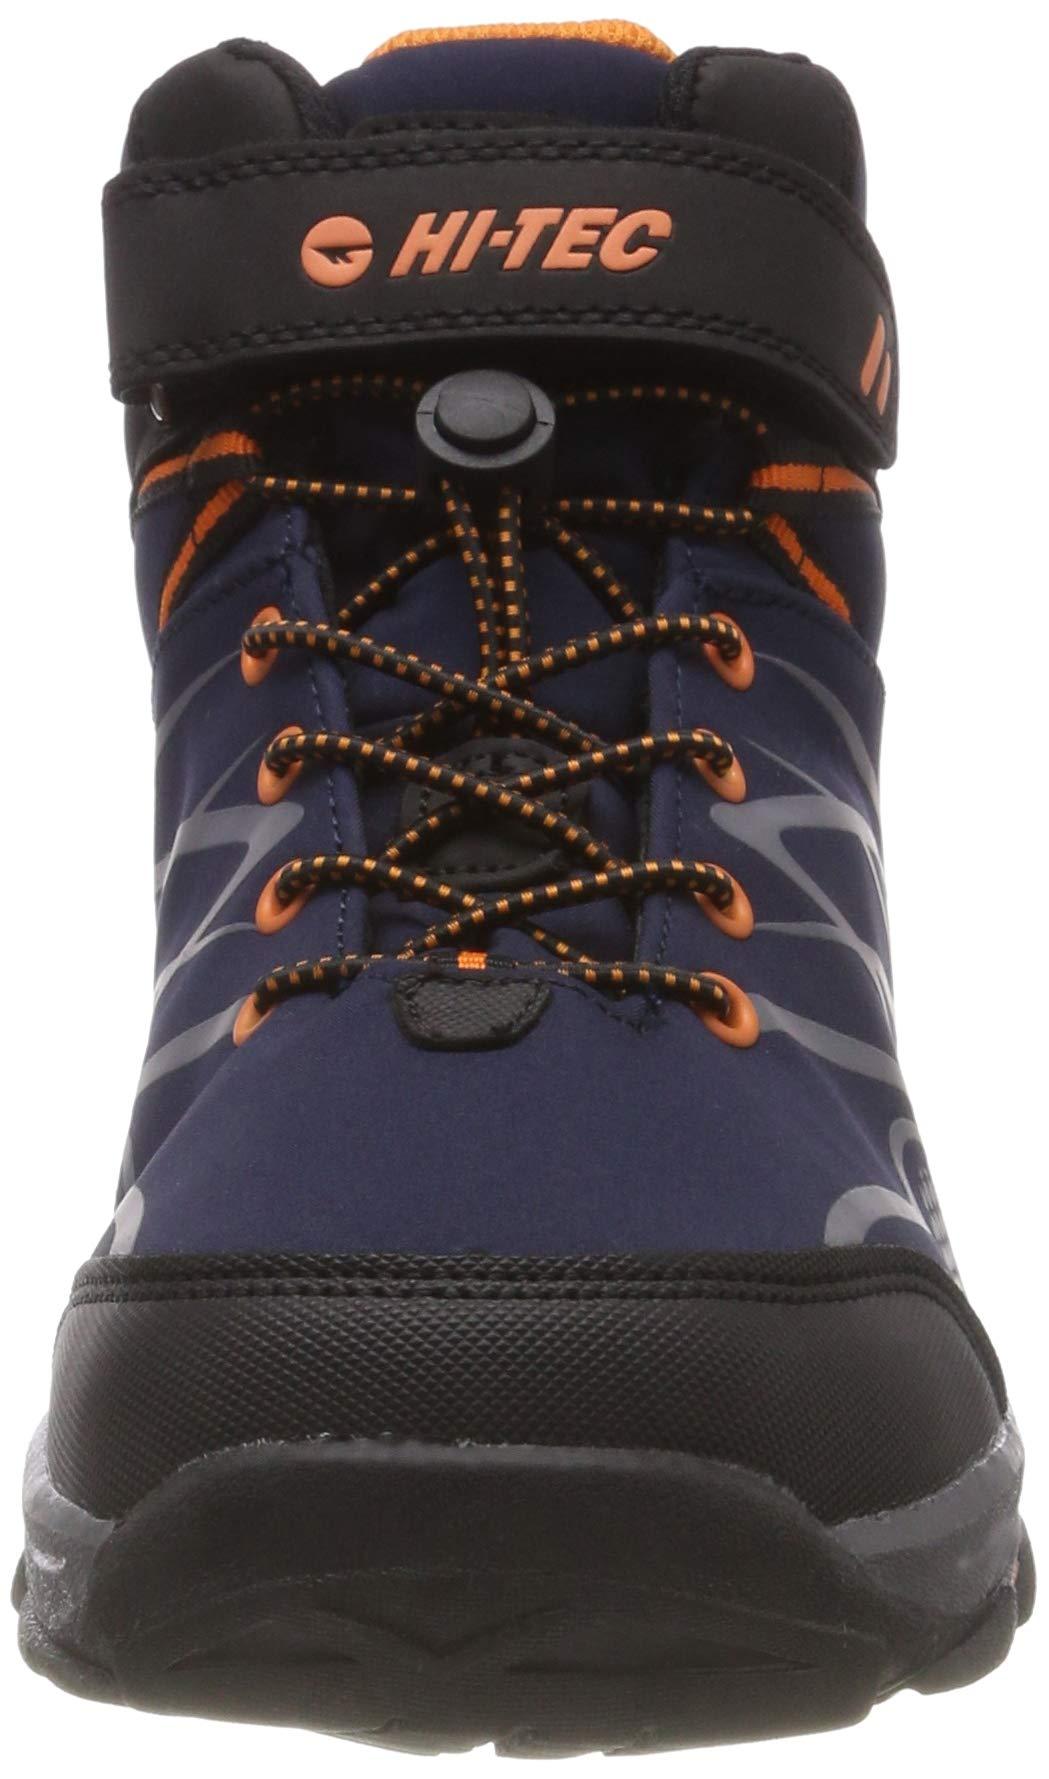 Hi-Tec Unisex Kids' Blackout Mid Wp Jr High Rise Hiking Boots 4